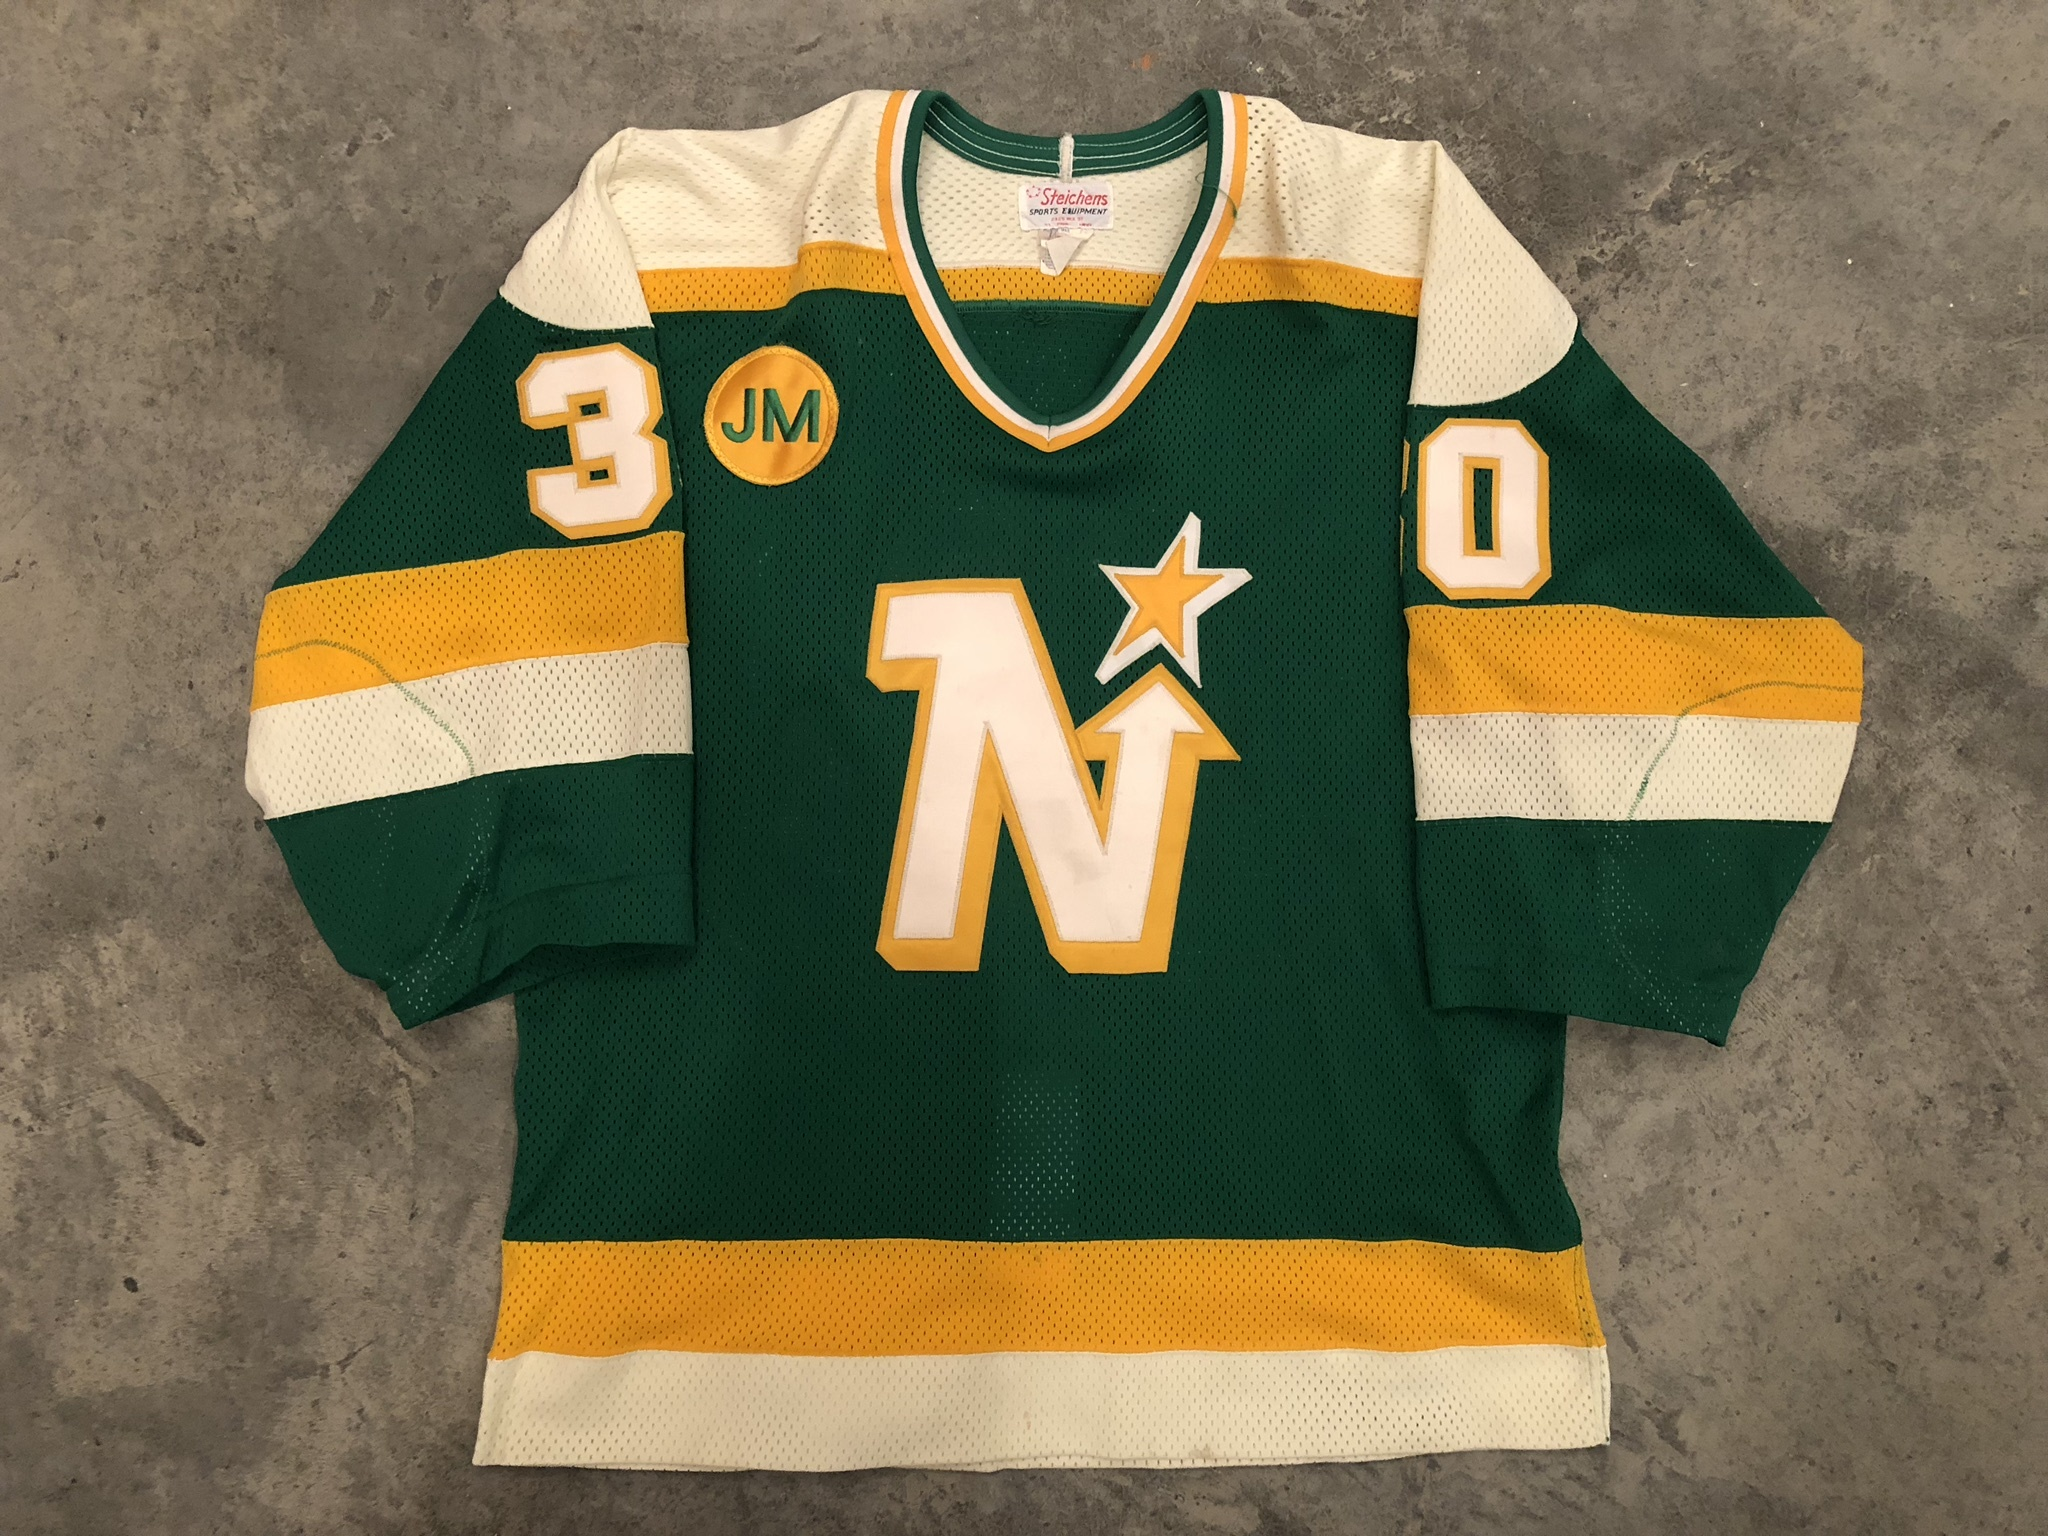 1987-88 Jon Casey game worn road jersey with JM - John Mariucci memorial patch